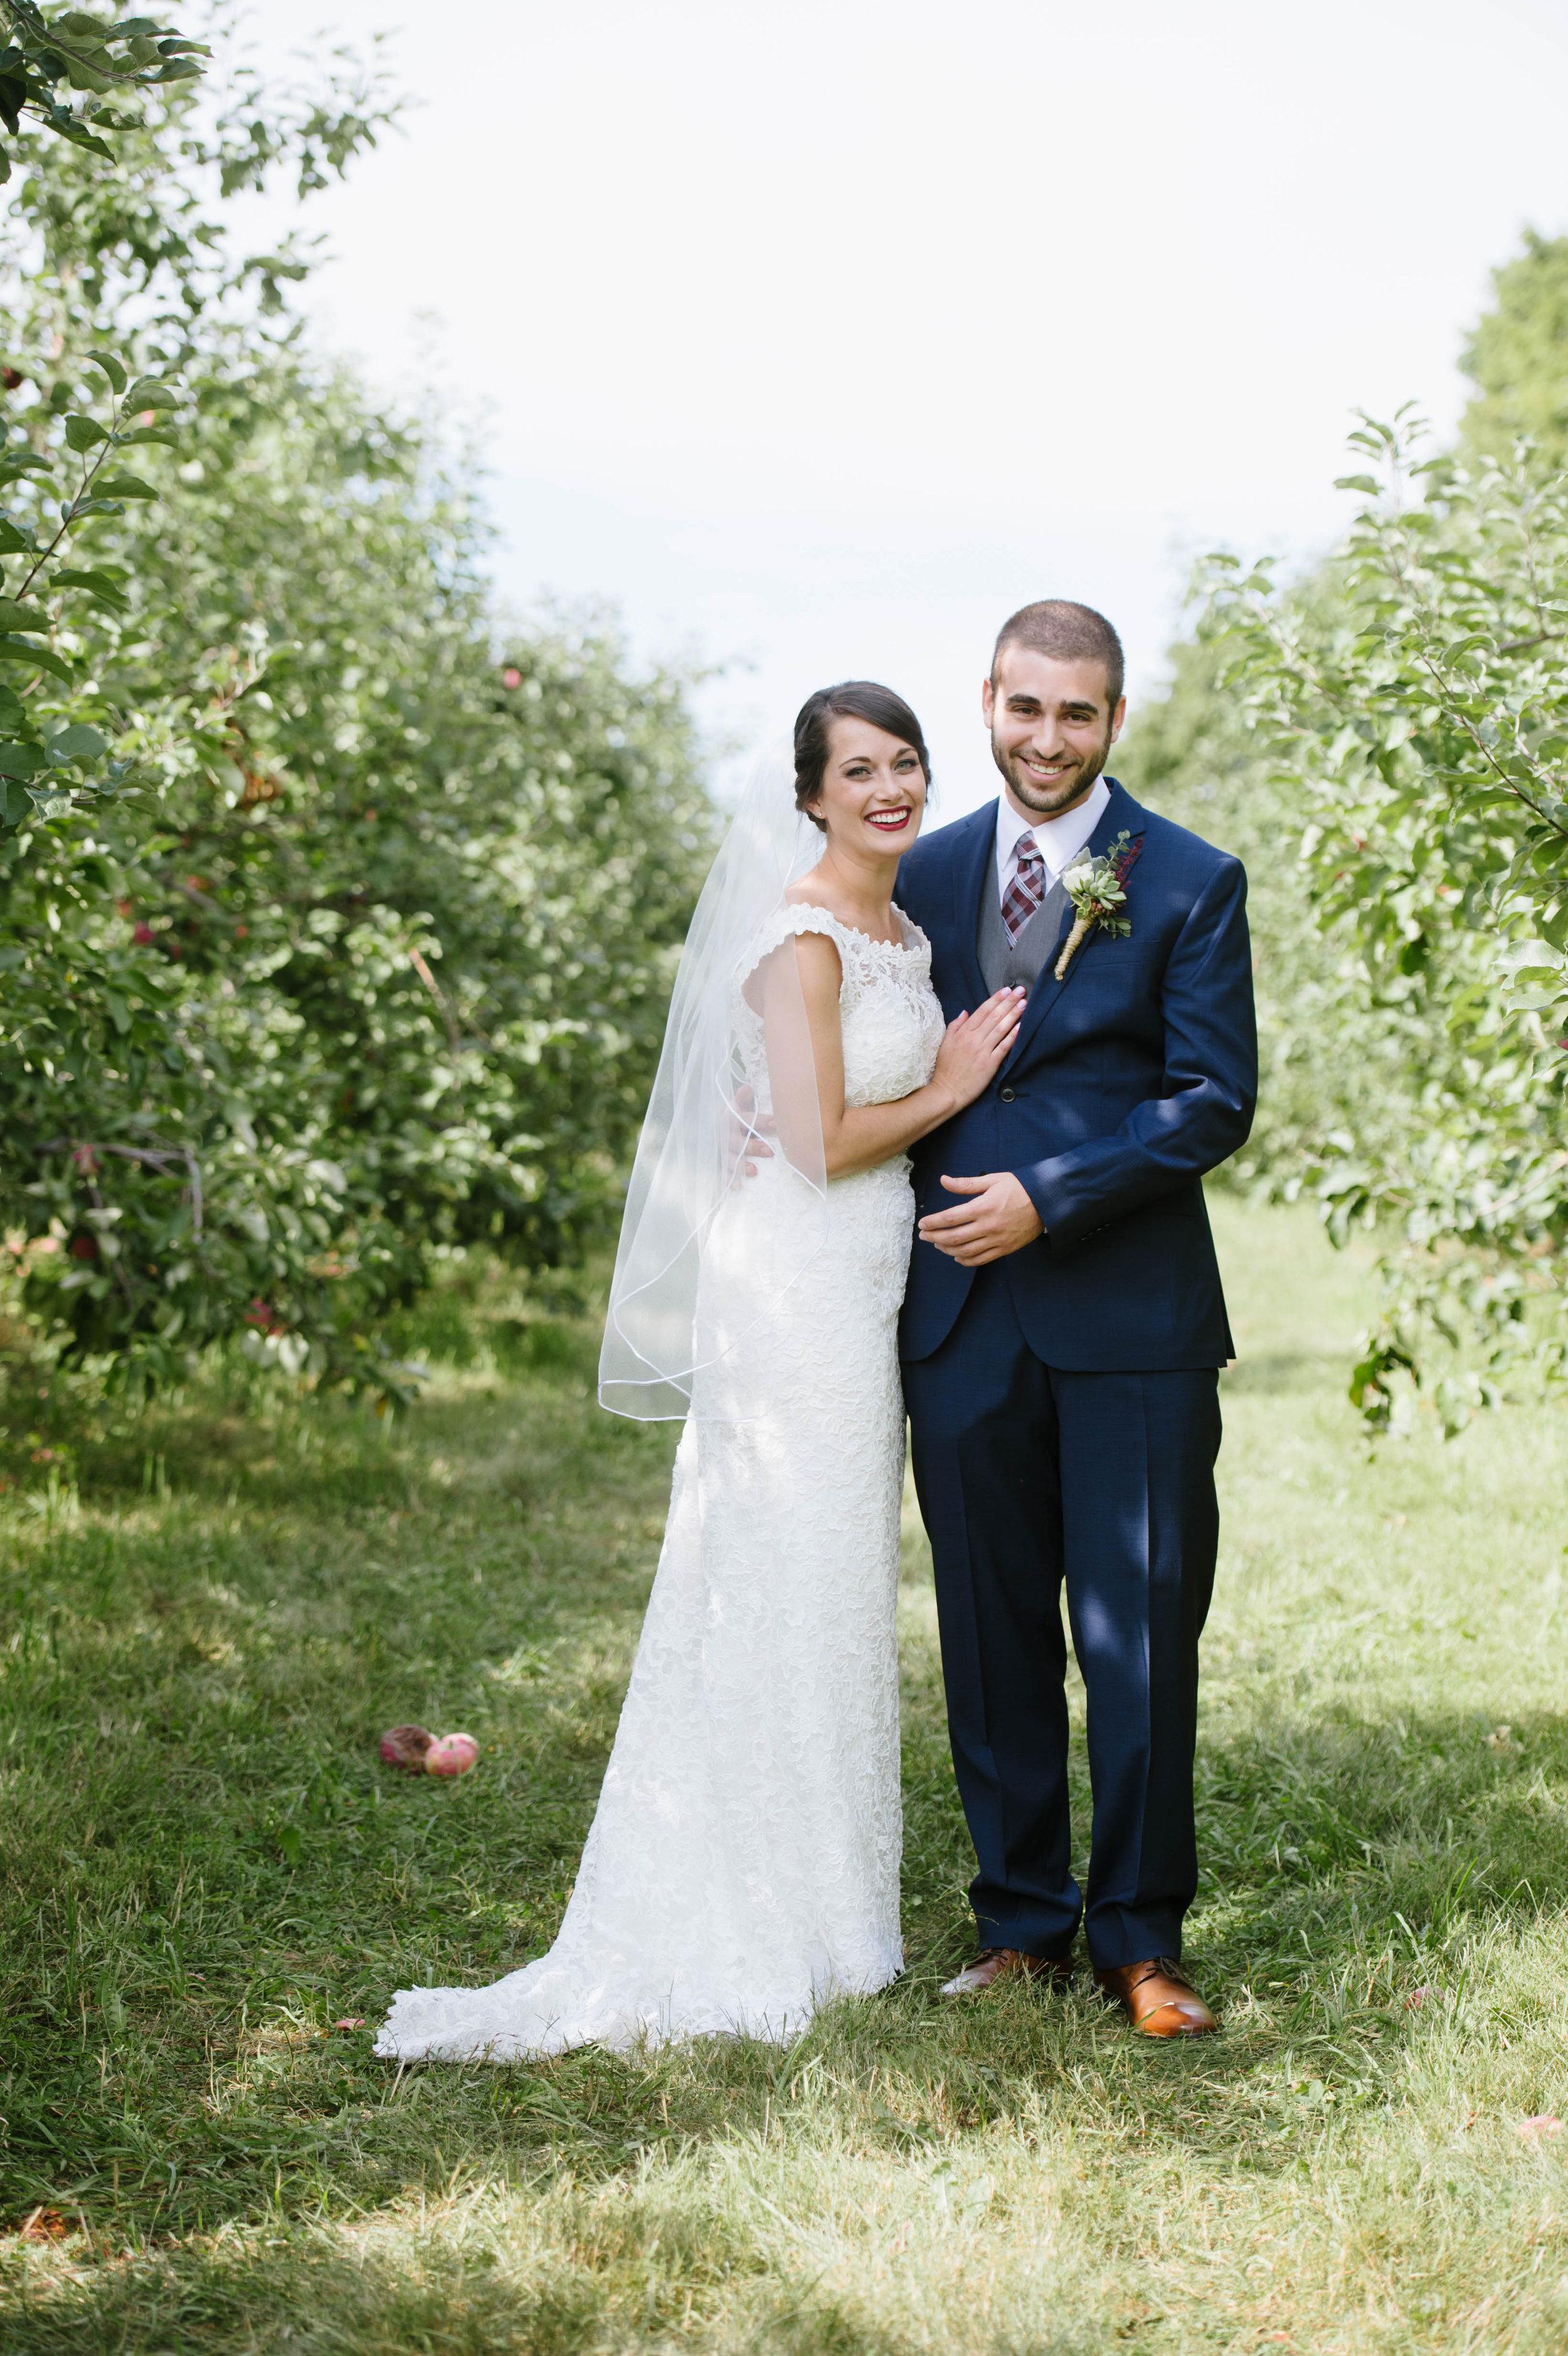 Quonquont-Farm-Unique_Wedding010.jpg